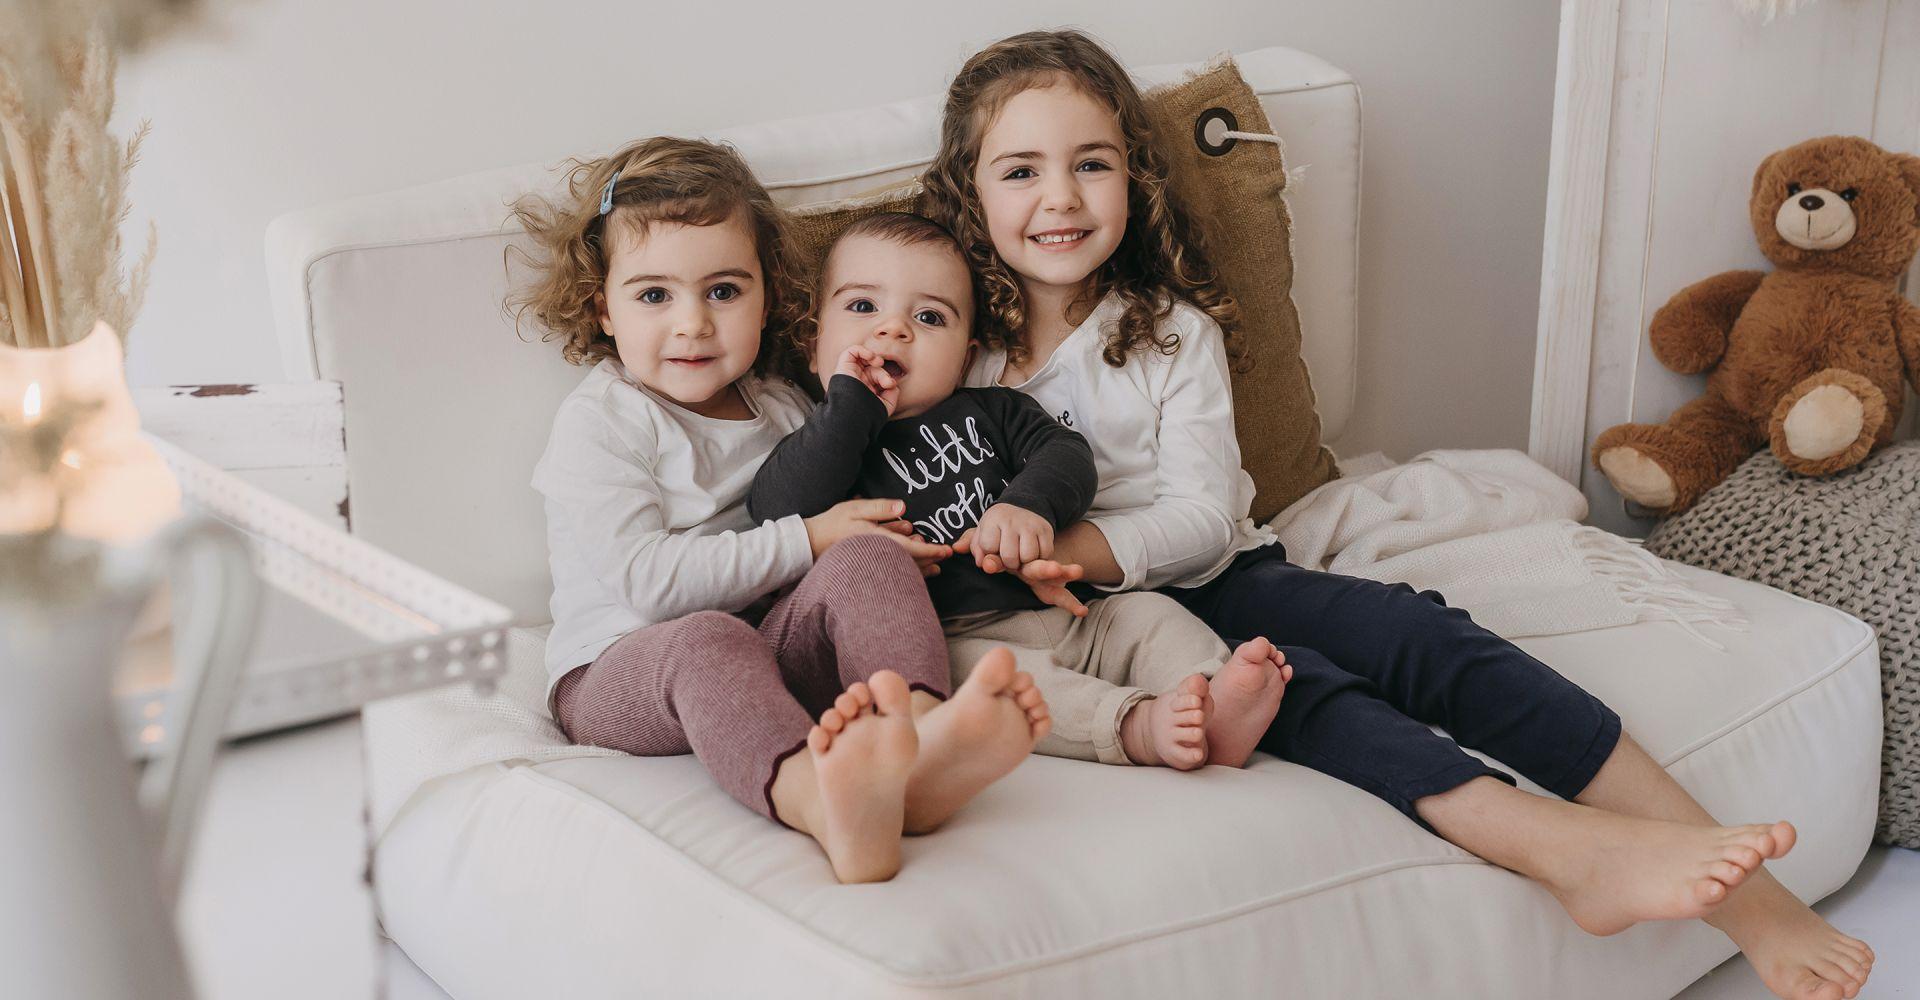 Familienfotos-Familienfotografie-Porträtfotografie-Fotografie-Katharina-Müller-Limburg-Eschhofen-www.fotografie-km.de-Indoor-und-Outdoor-Kinderfotografie